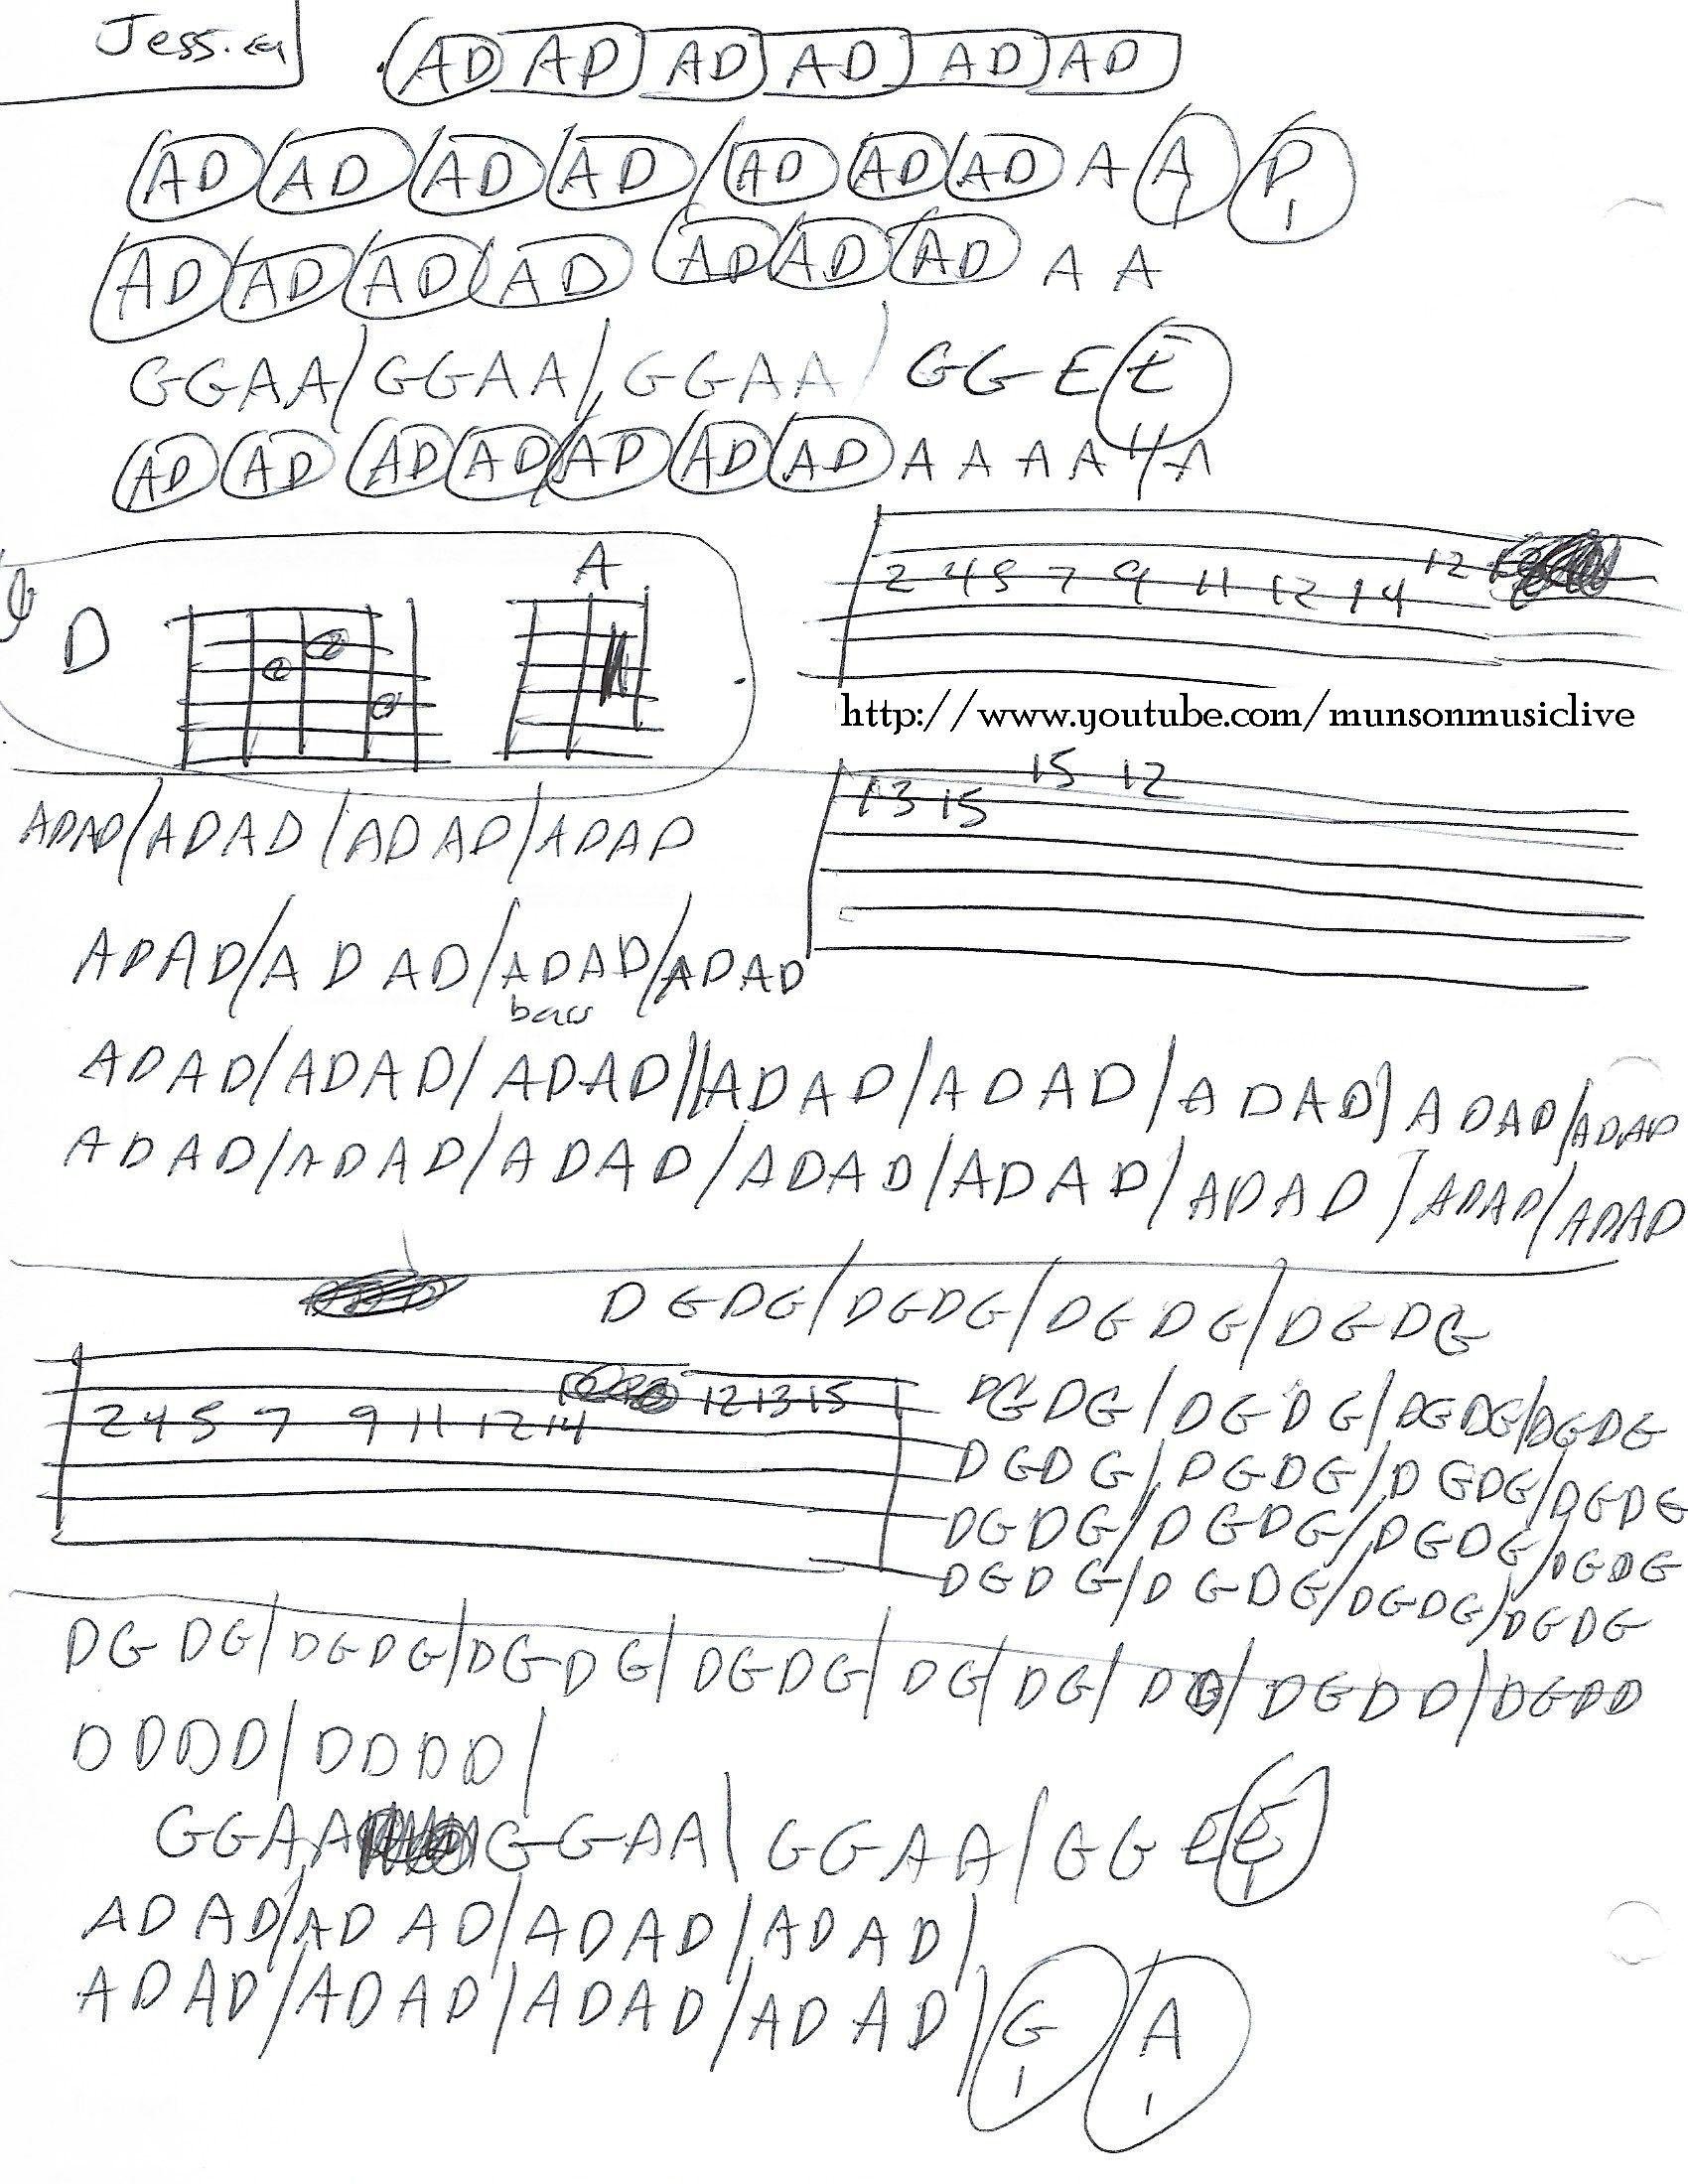 Jessica Allman Brothers Guitar Chord Chart Guitar Lesson Chord